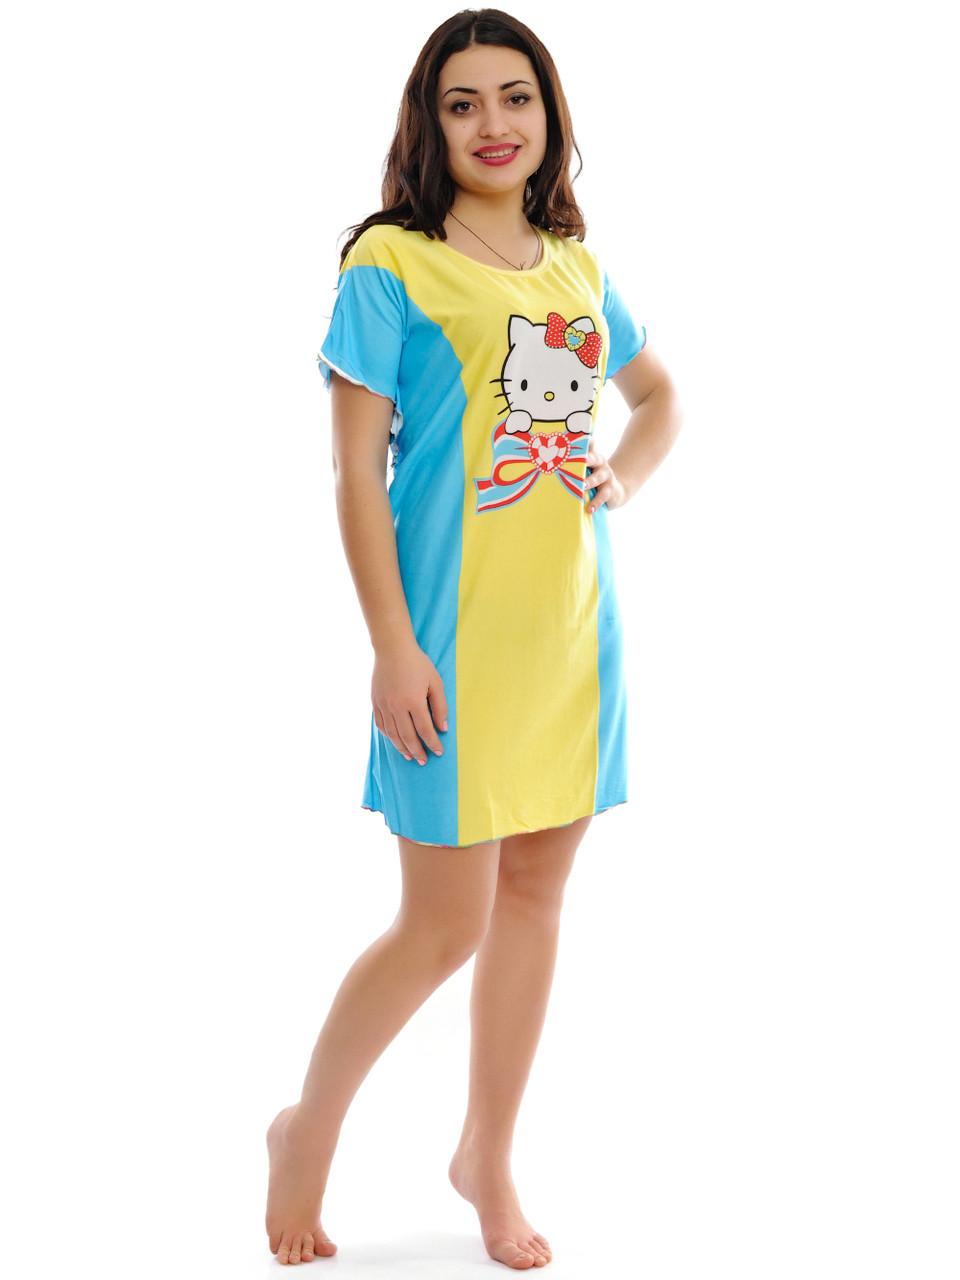 86fa1cc51784c Женская ночная рубашка Hello Kitty, цена 100 грн., купить в Одессе ...